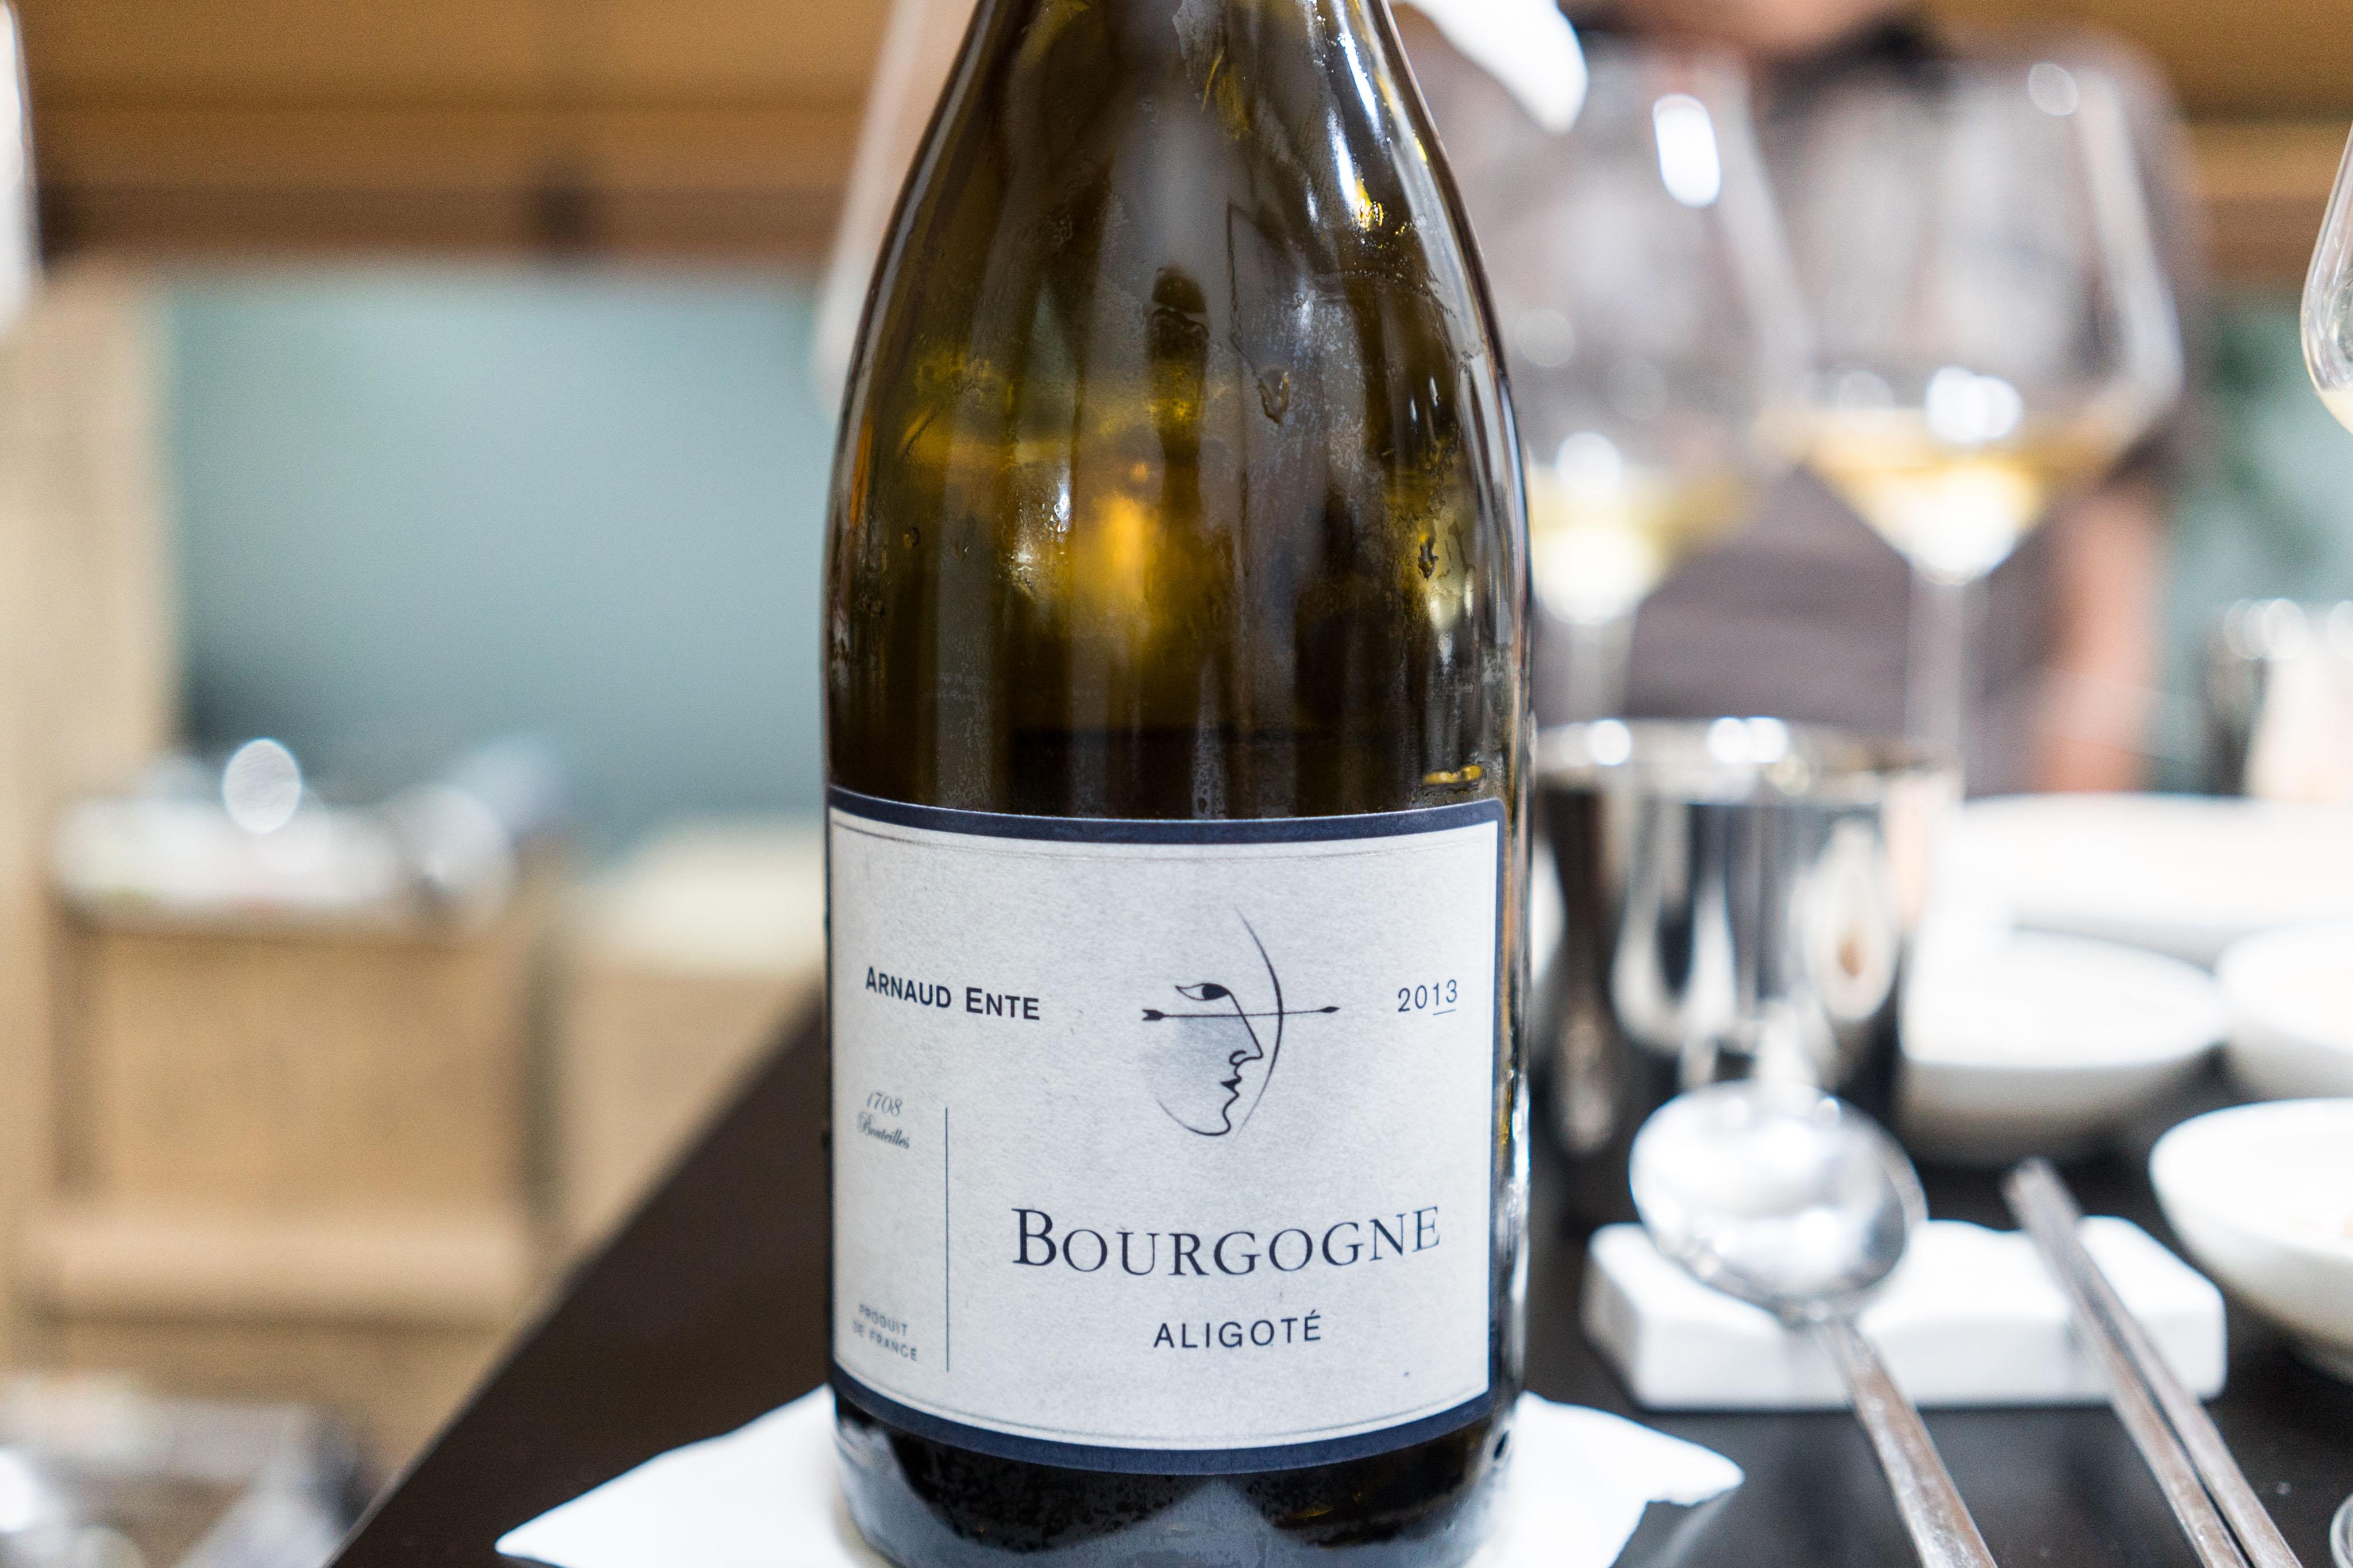 Domaine Arnaud Ente Bourgogne Aligote 2013